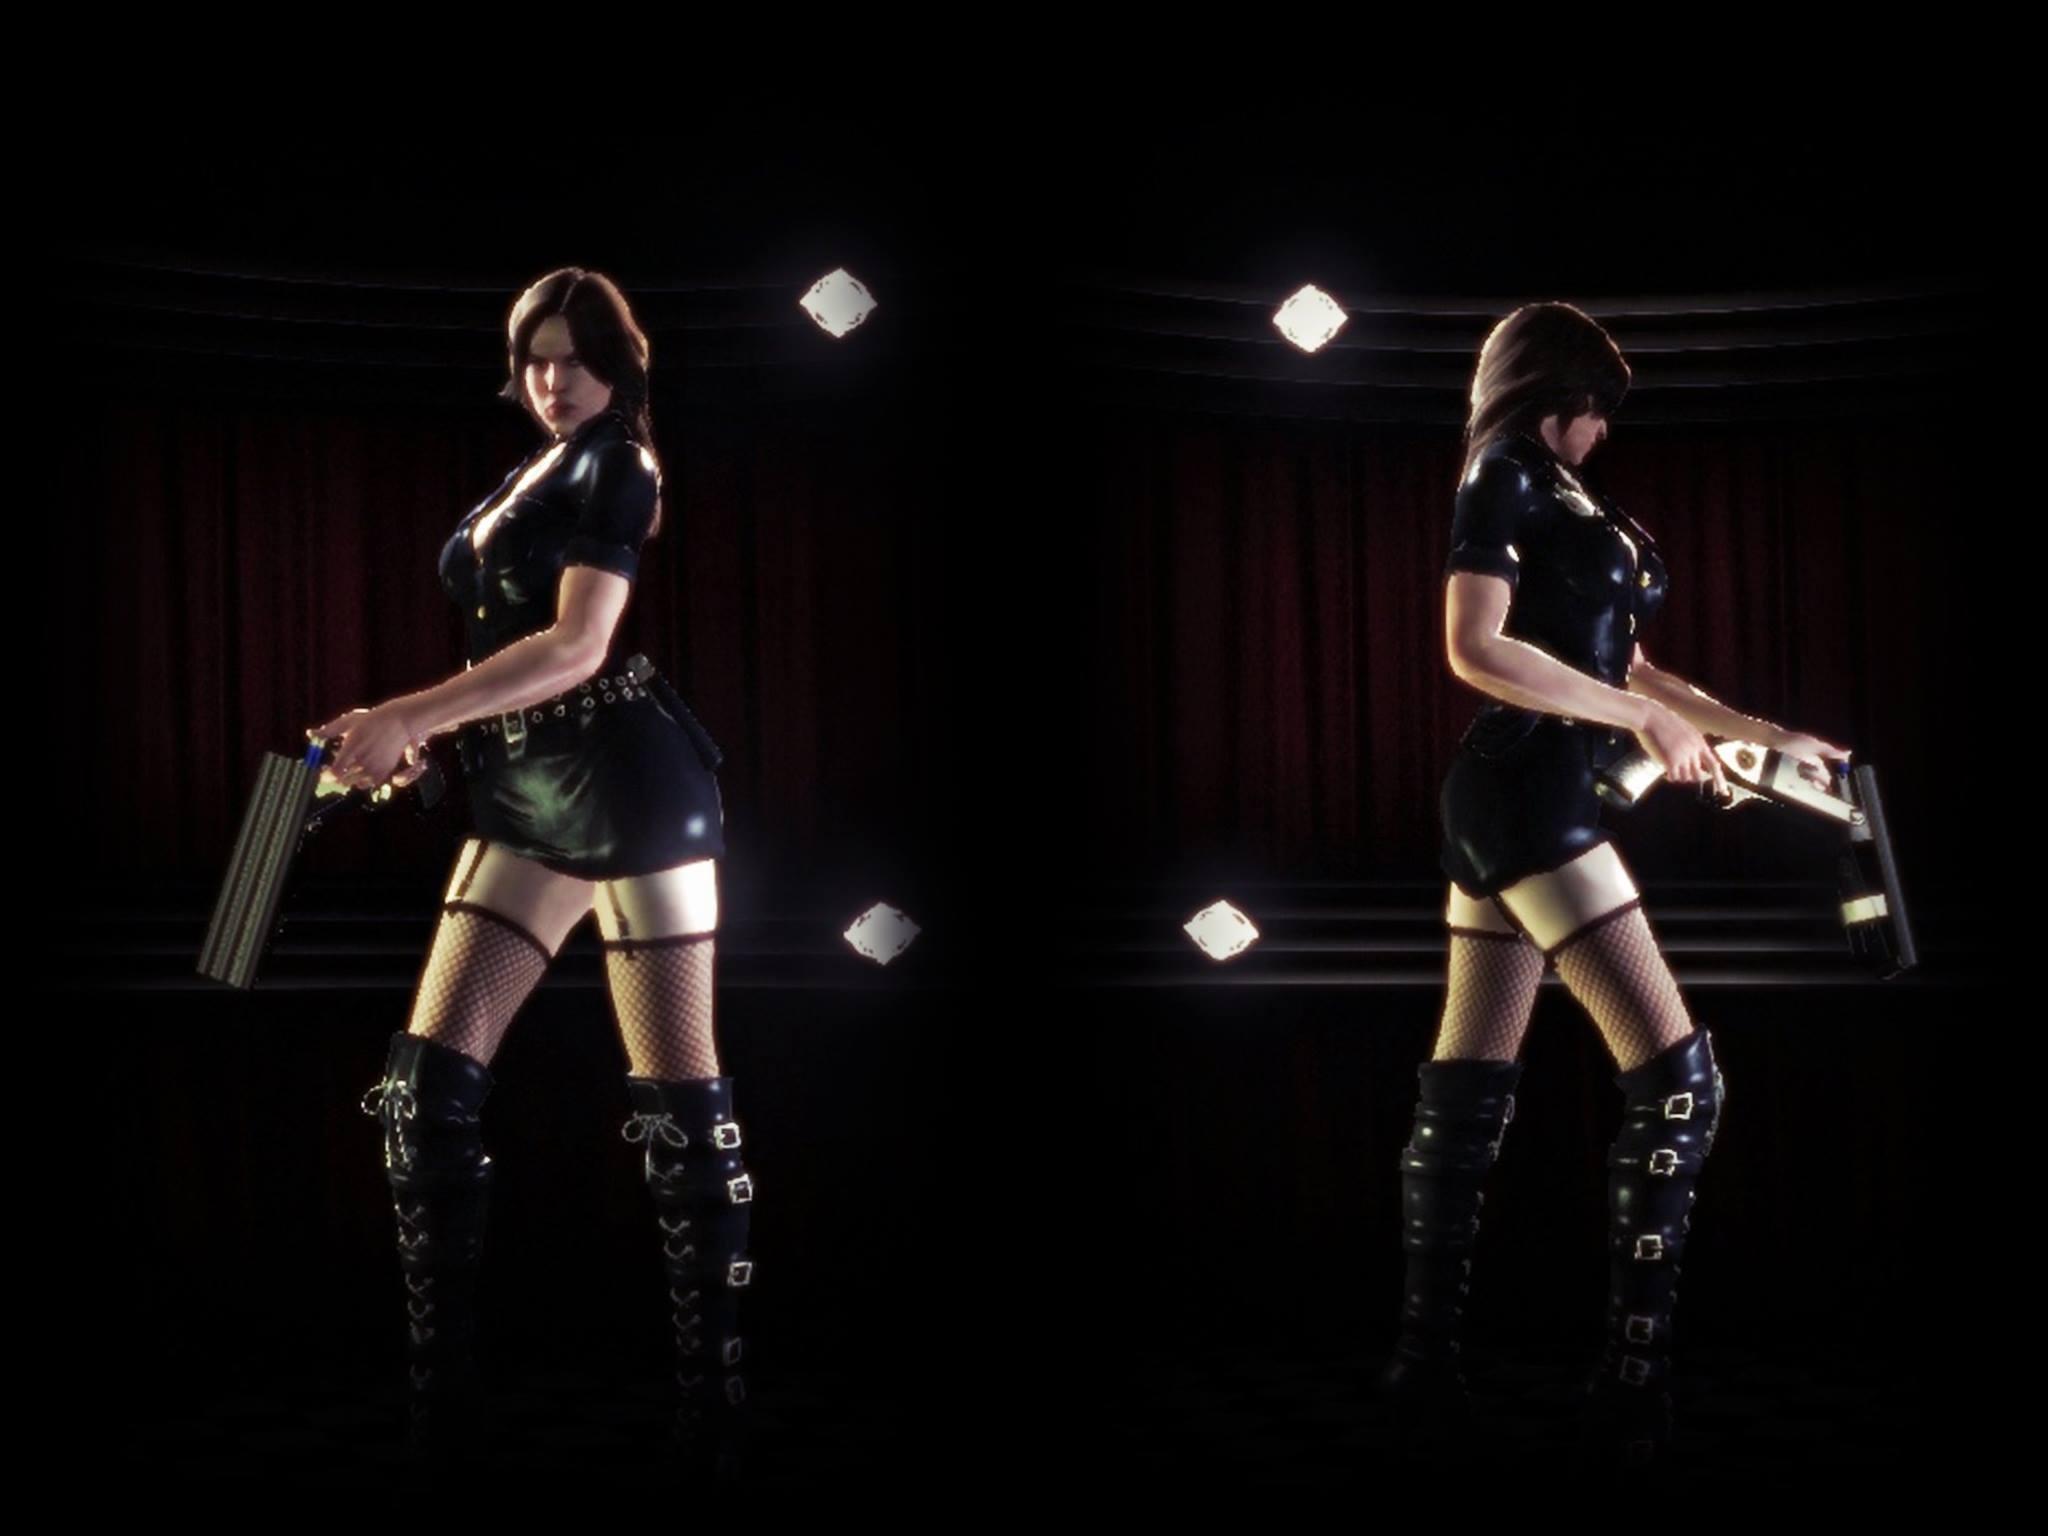 Helena Harper EX2 Remake 0_111a2b_945bc88b_orig